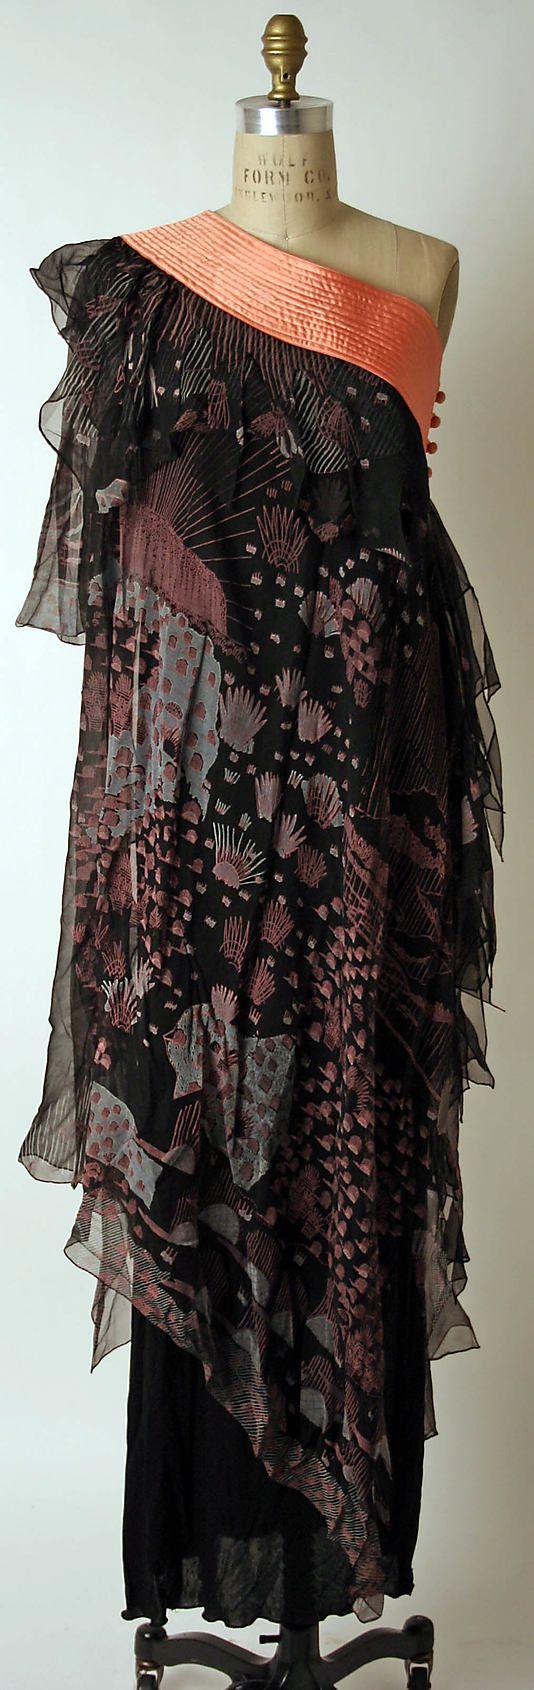 Evening dress  Zandra Rhodes (British, born 1940)  Date: 1974 Culture: British Medium: silk, acetate